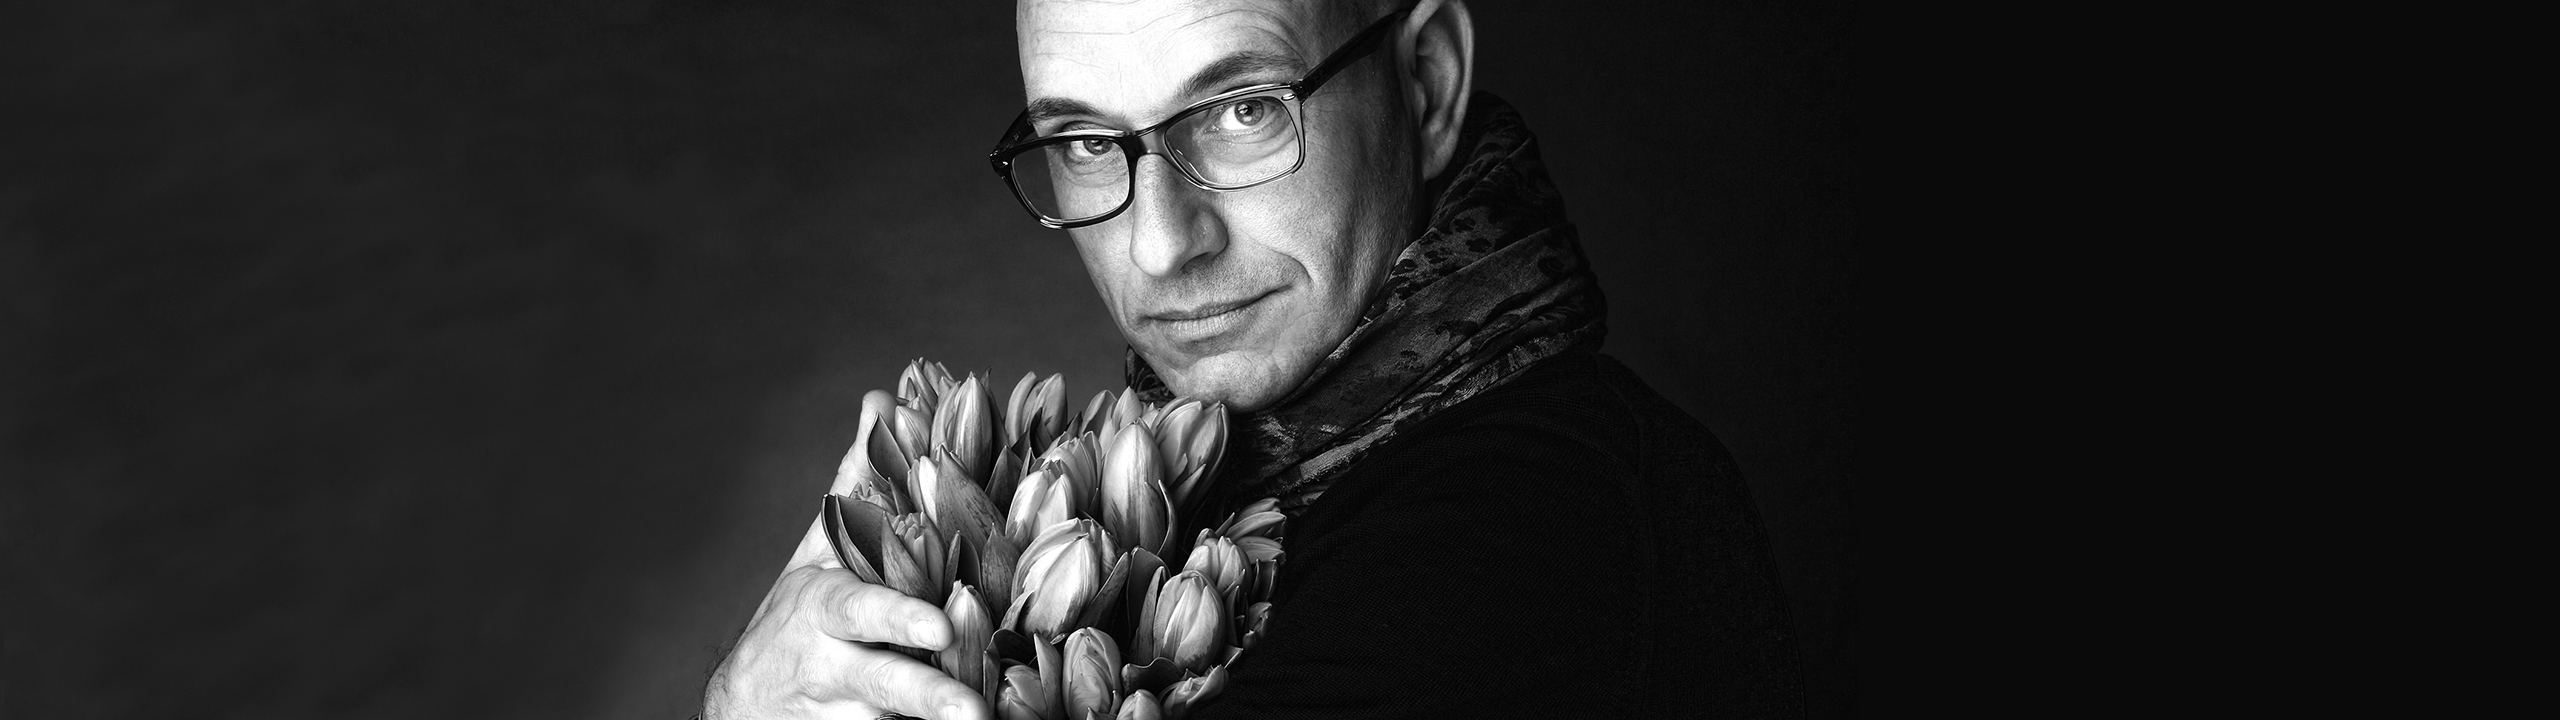 layerslider-pieterlandman-portret-bloomingvision